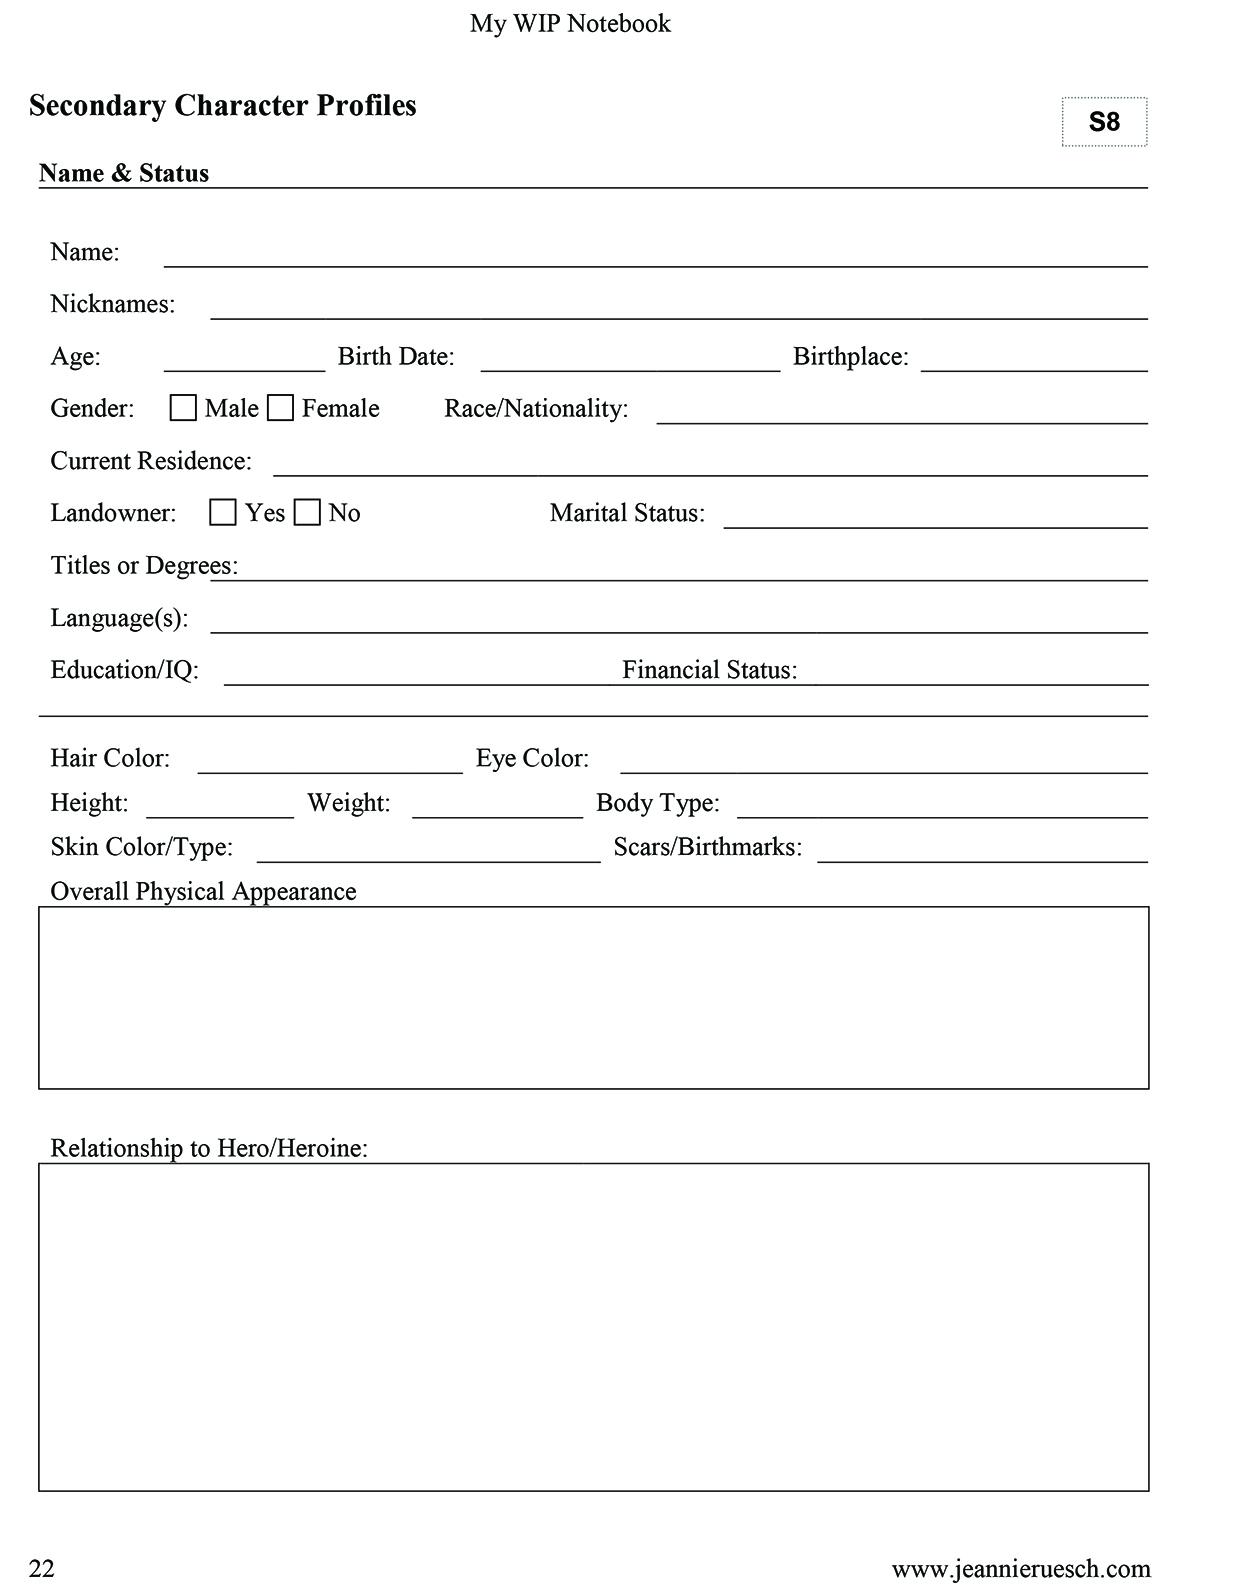 Work in Progress Notebook (PDF Printable Version)